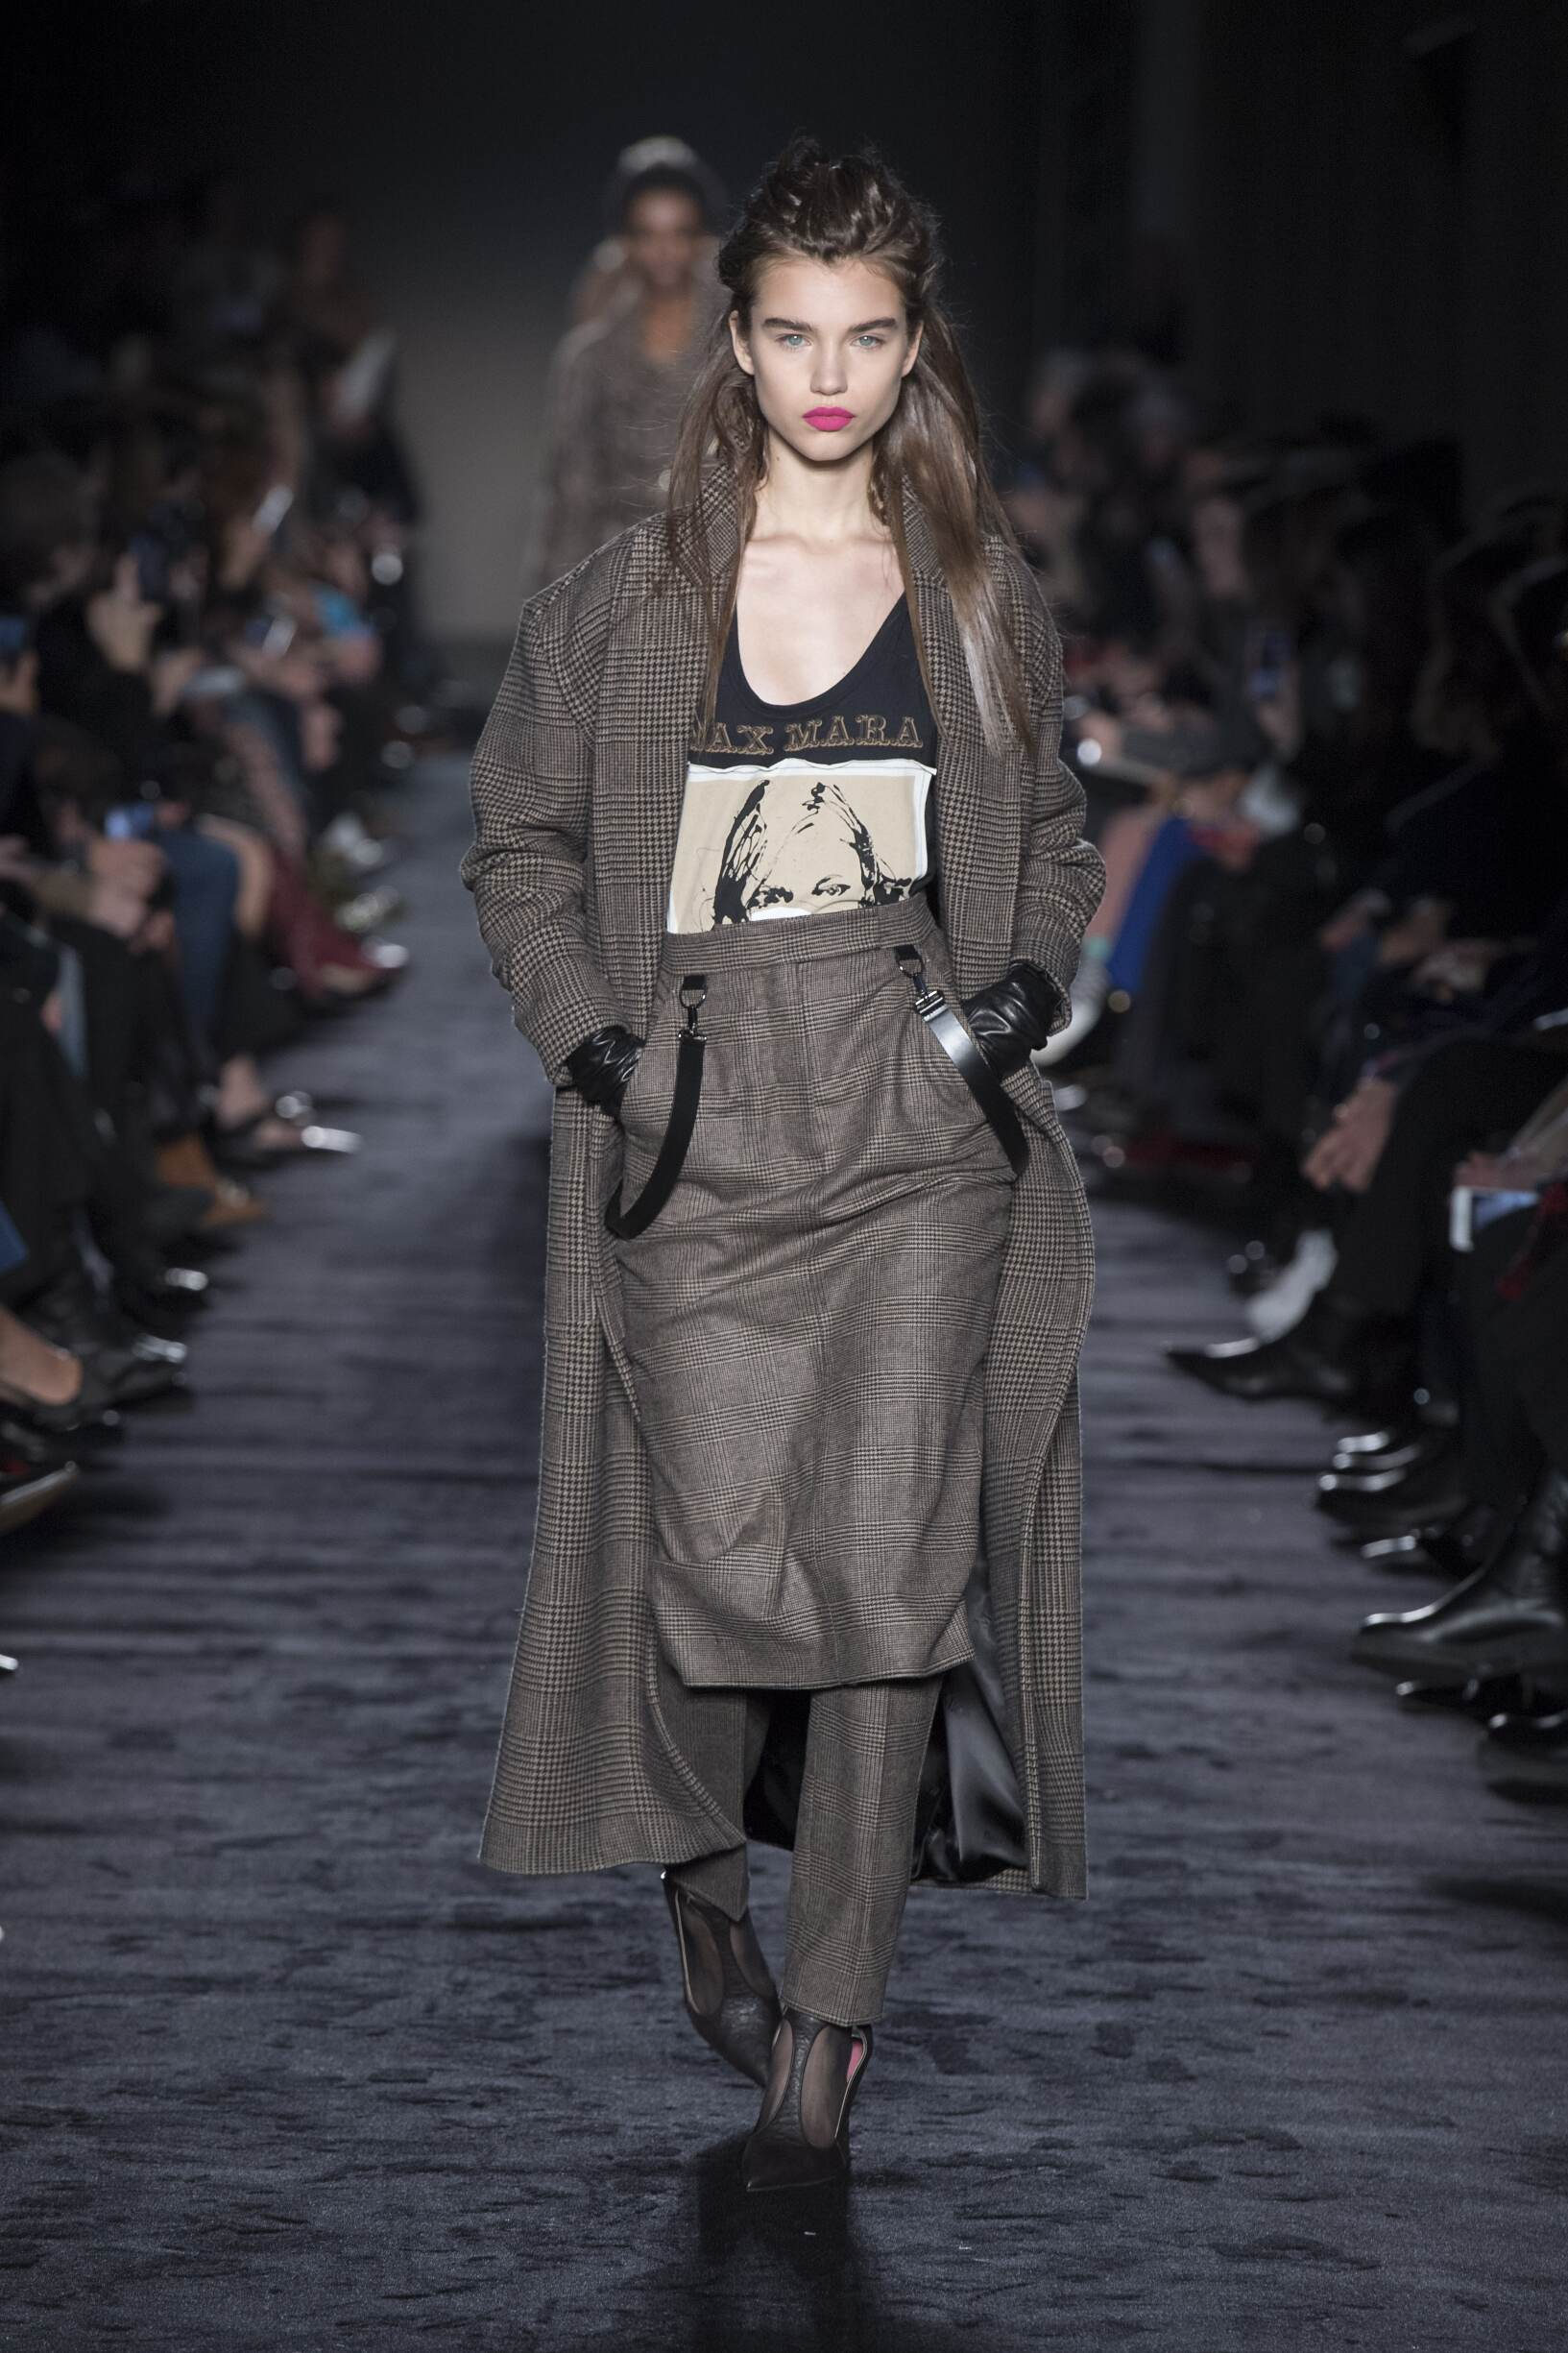 Max Mara FW 2018 Womenswear